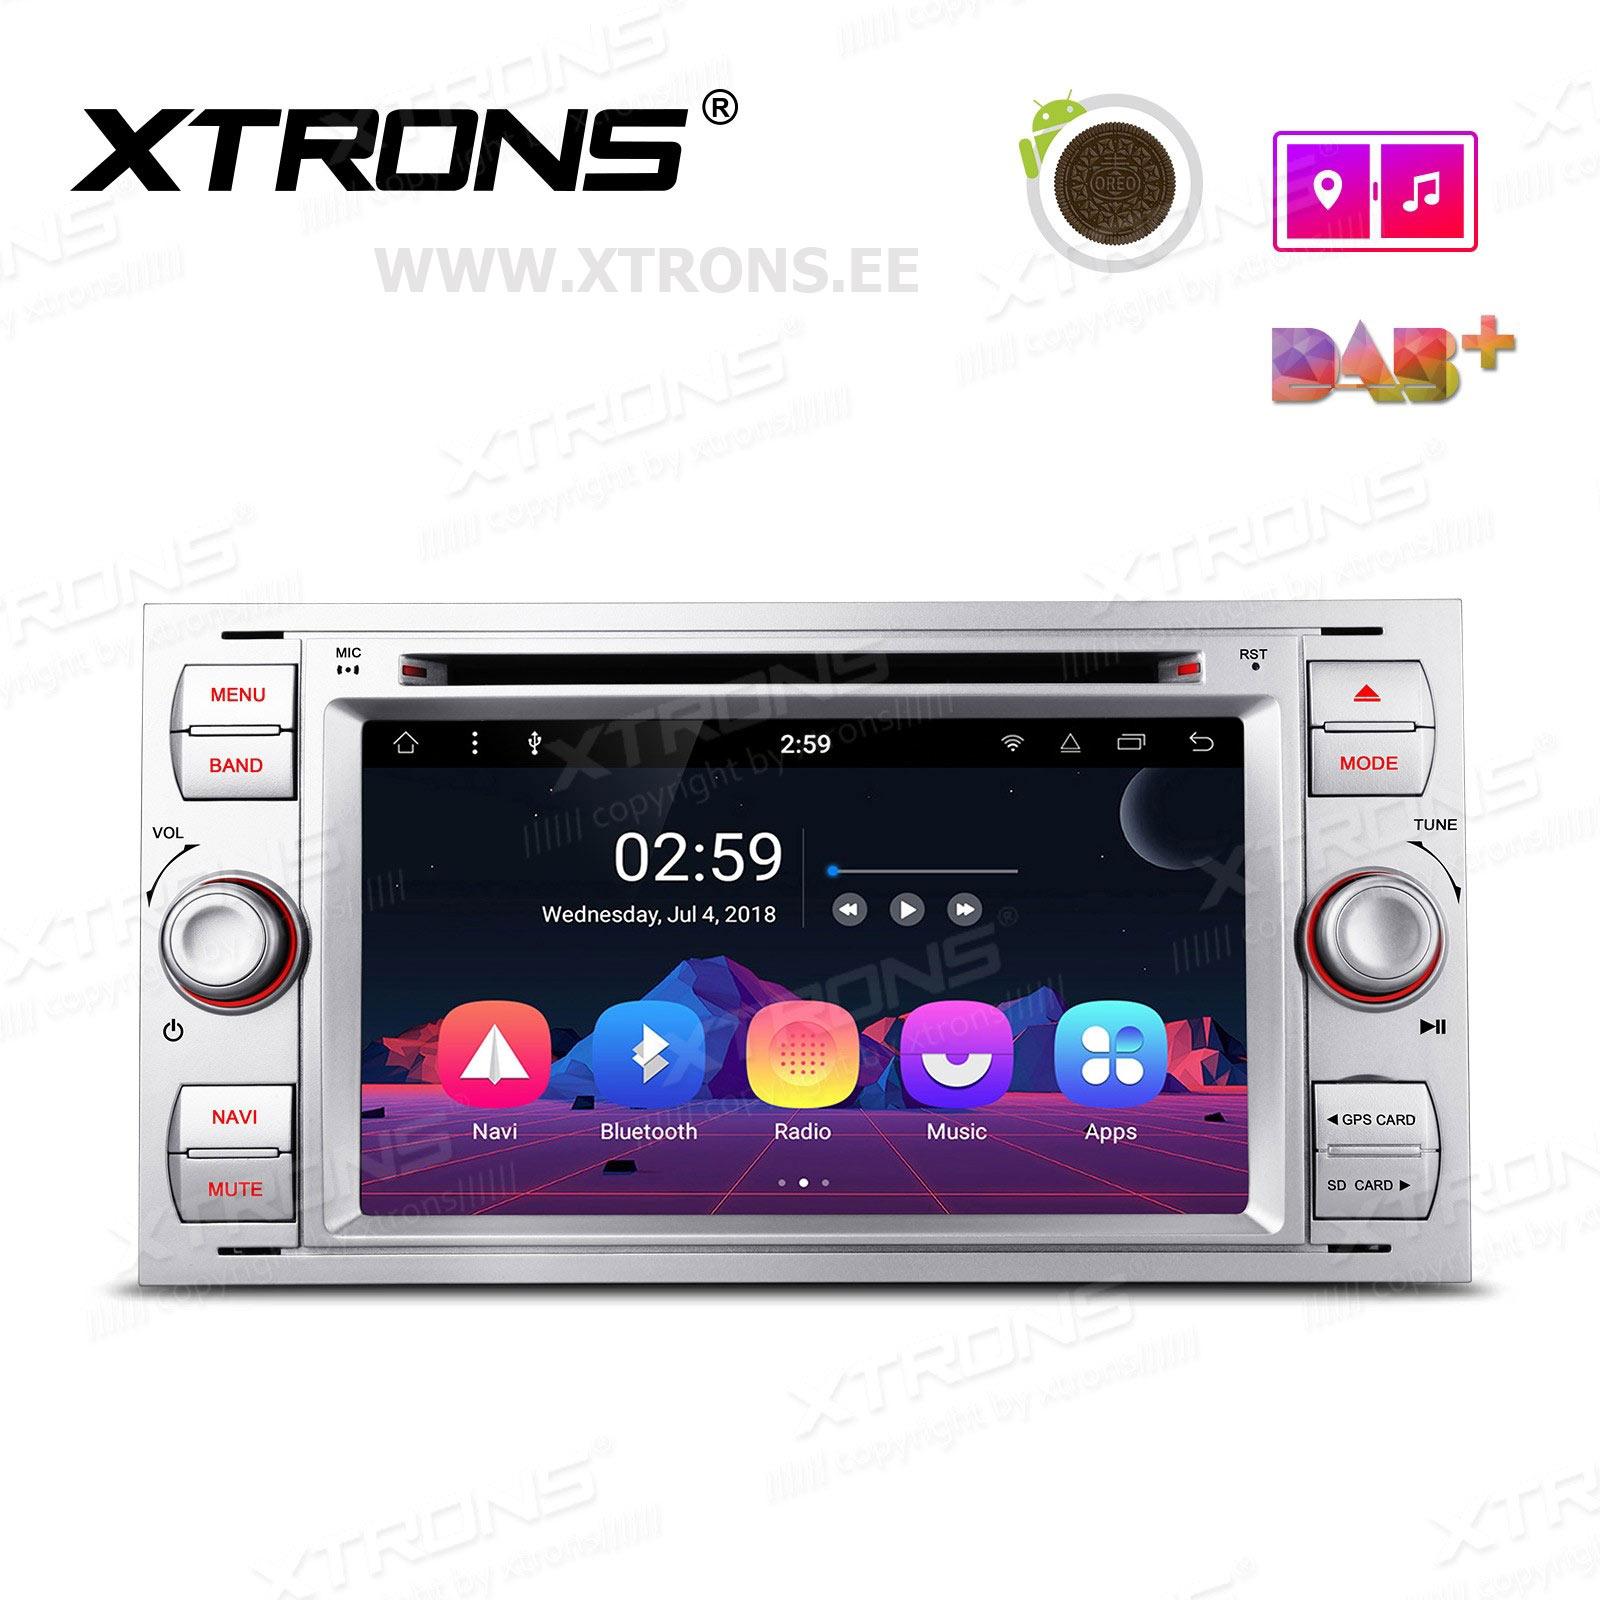 XTRONS PR78QSF-S